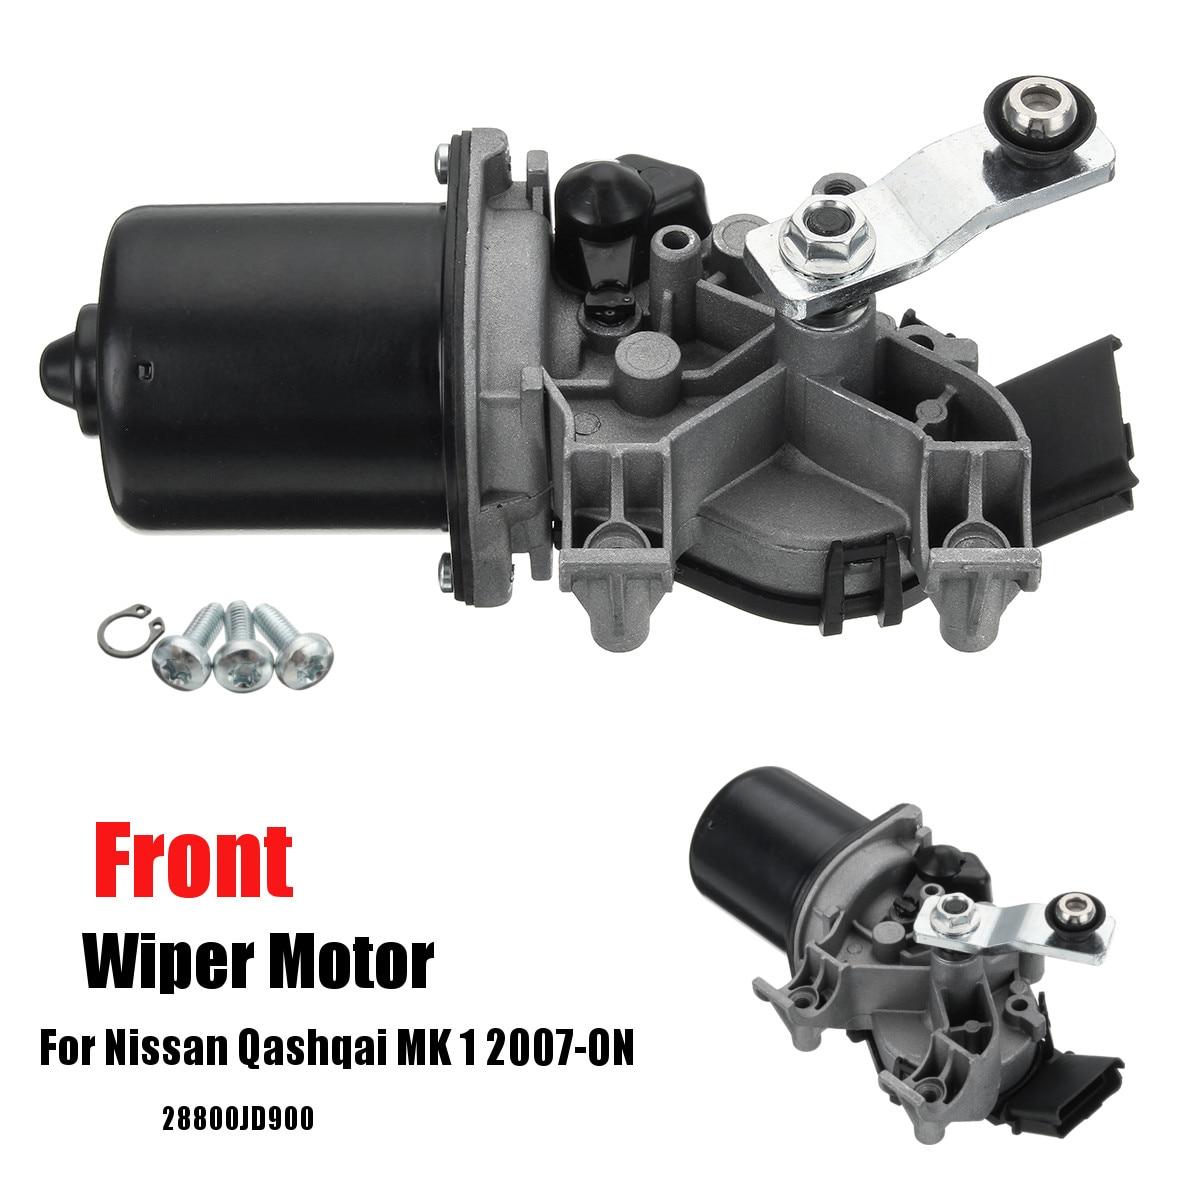 Car Front Windscreen Windshield Wiper Motor 28800JD900 for Nissan Qashqai MK 1 2007-ON car windscreen front